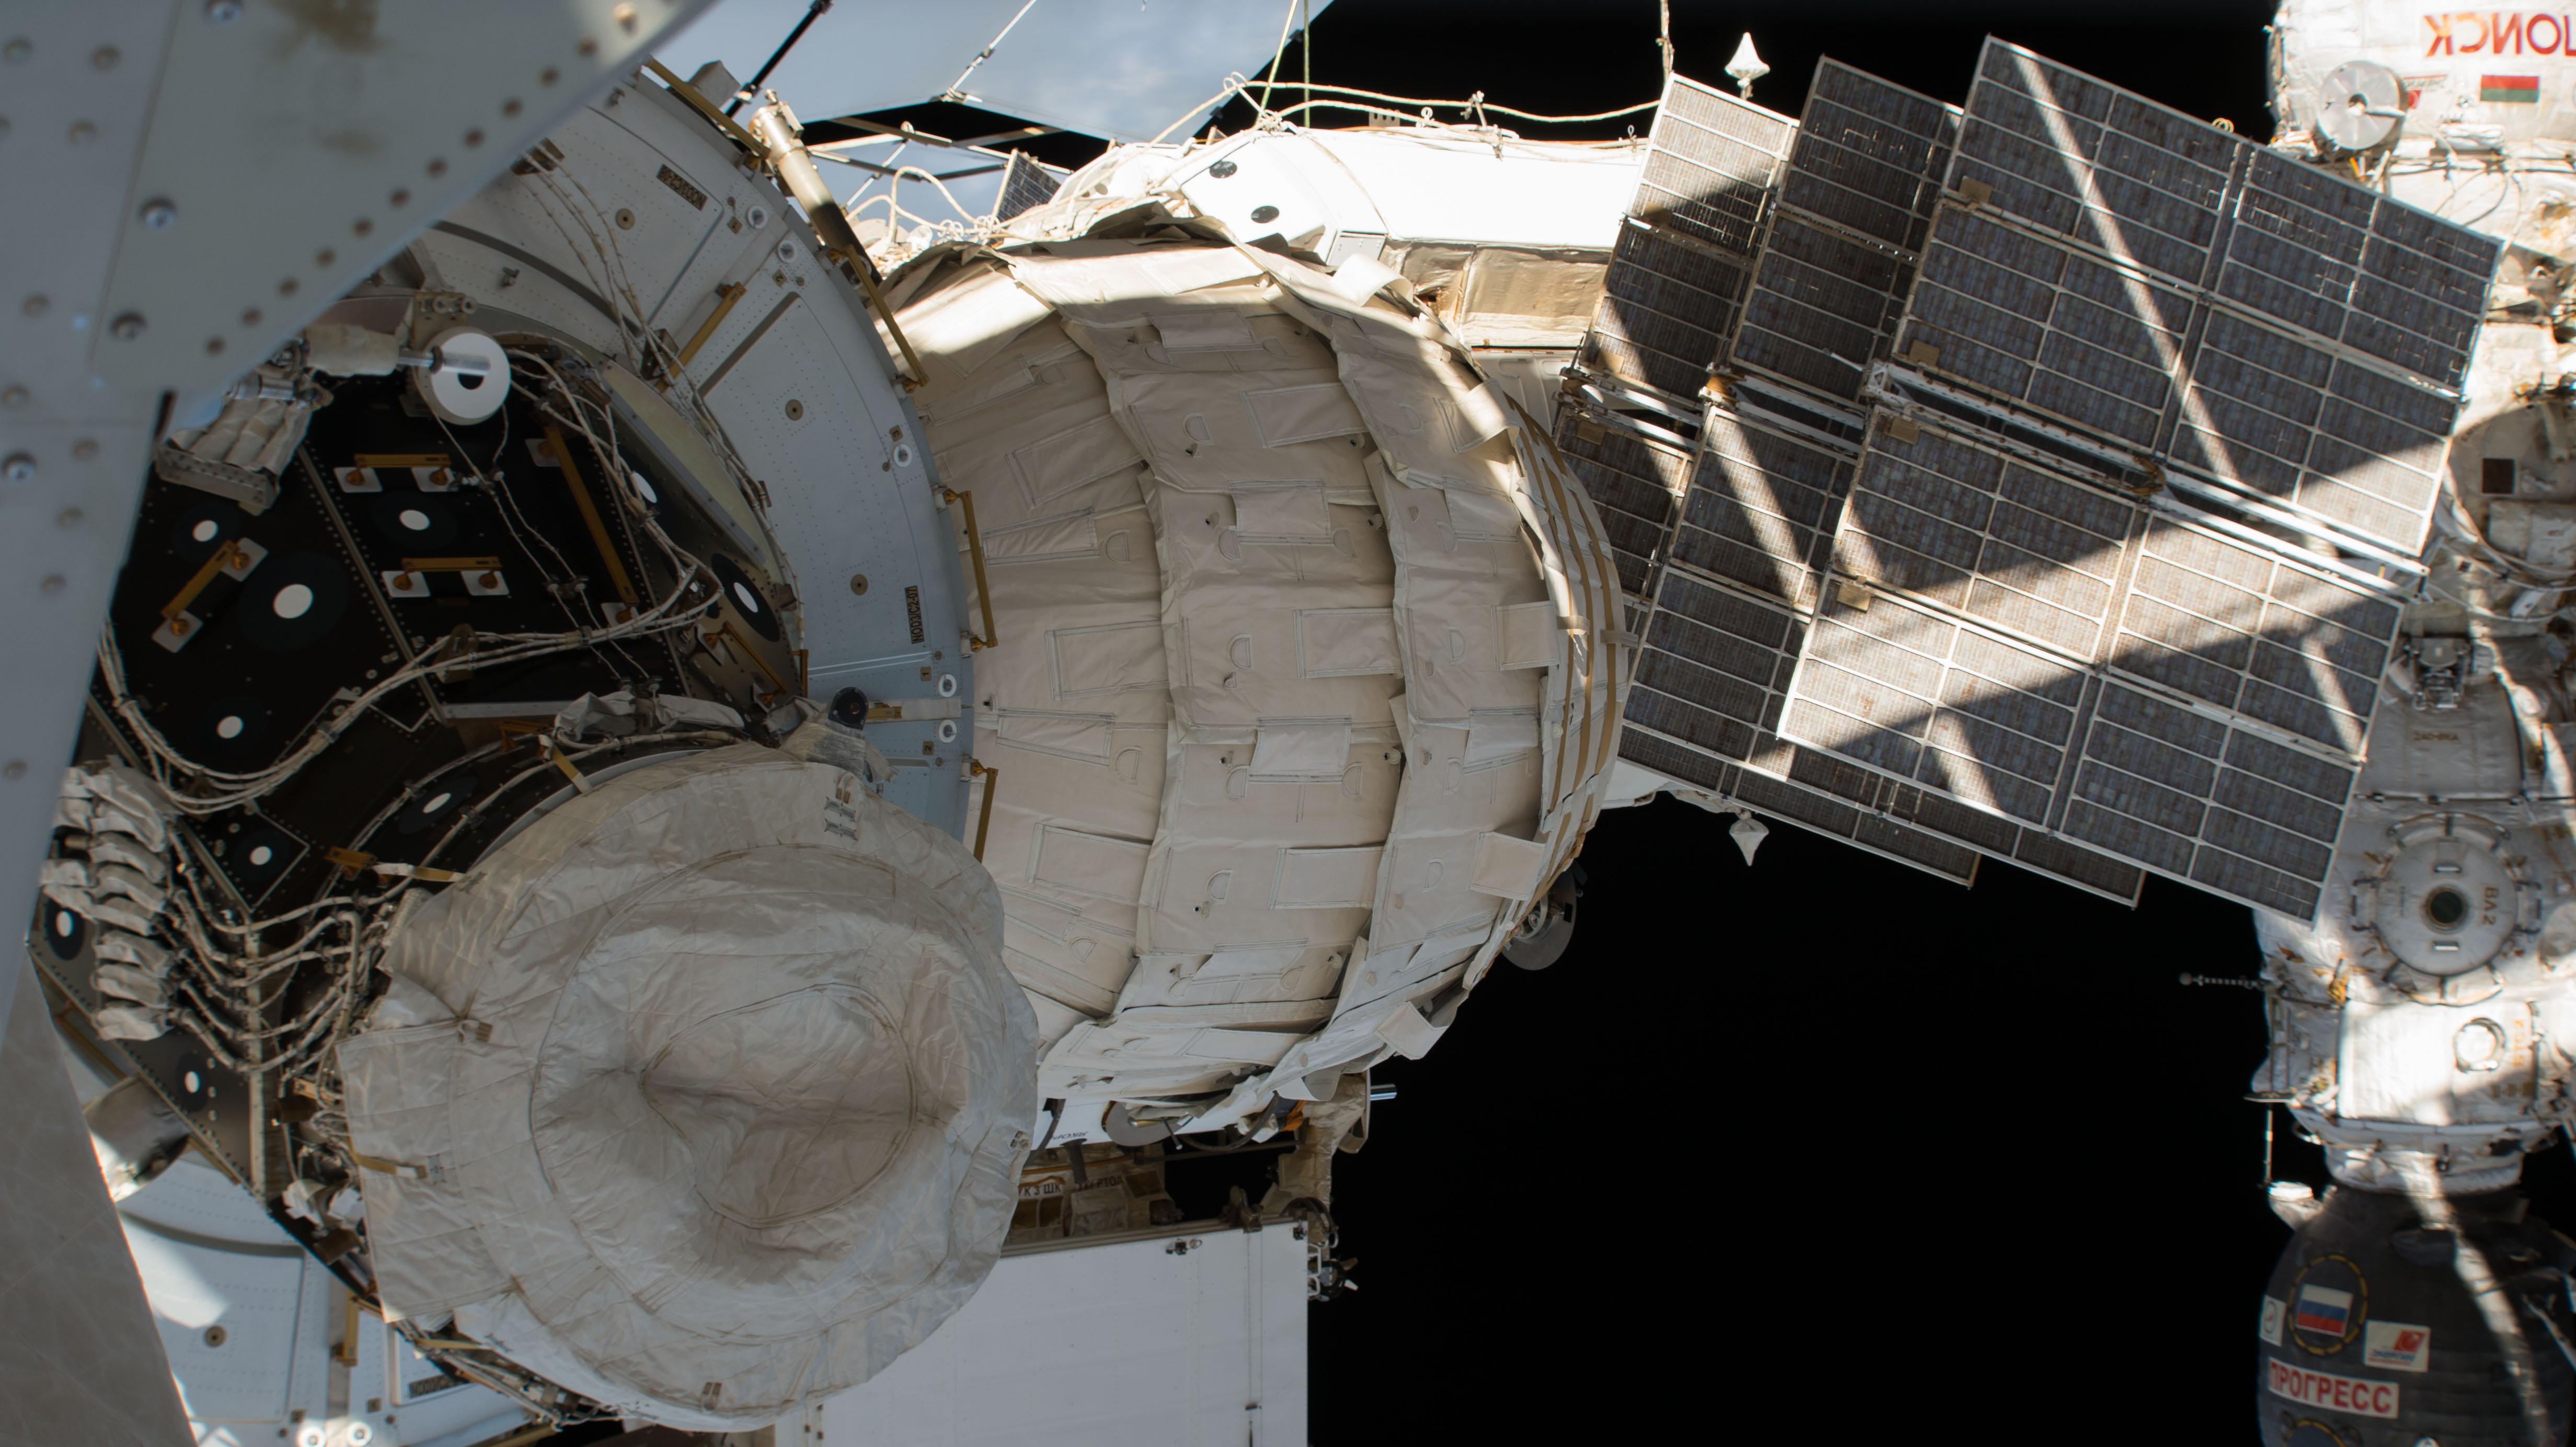 Space Station's Expandable Habitat